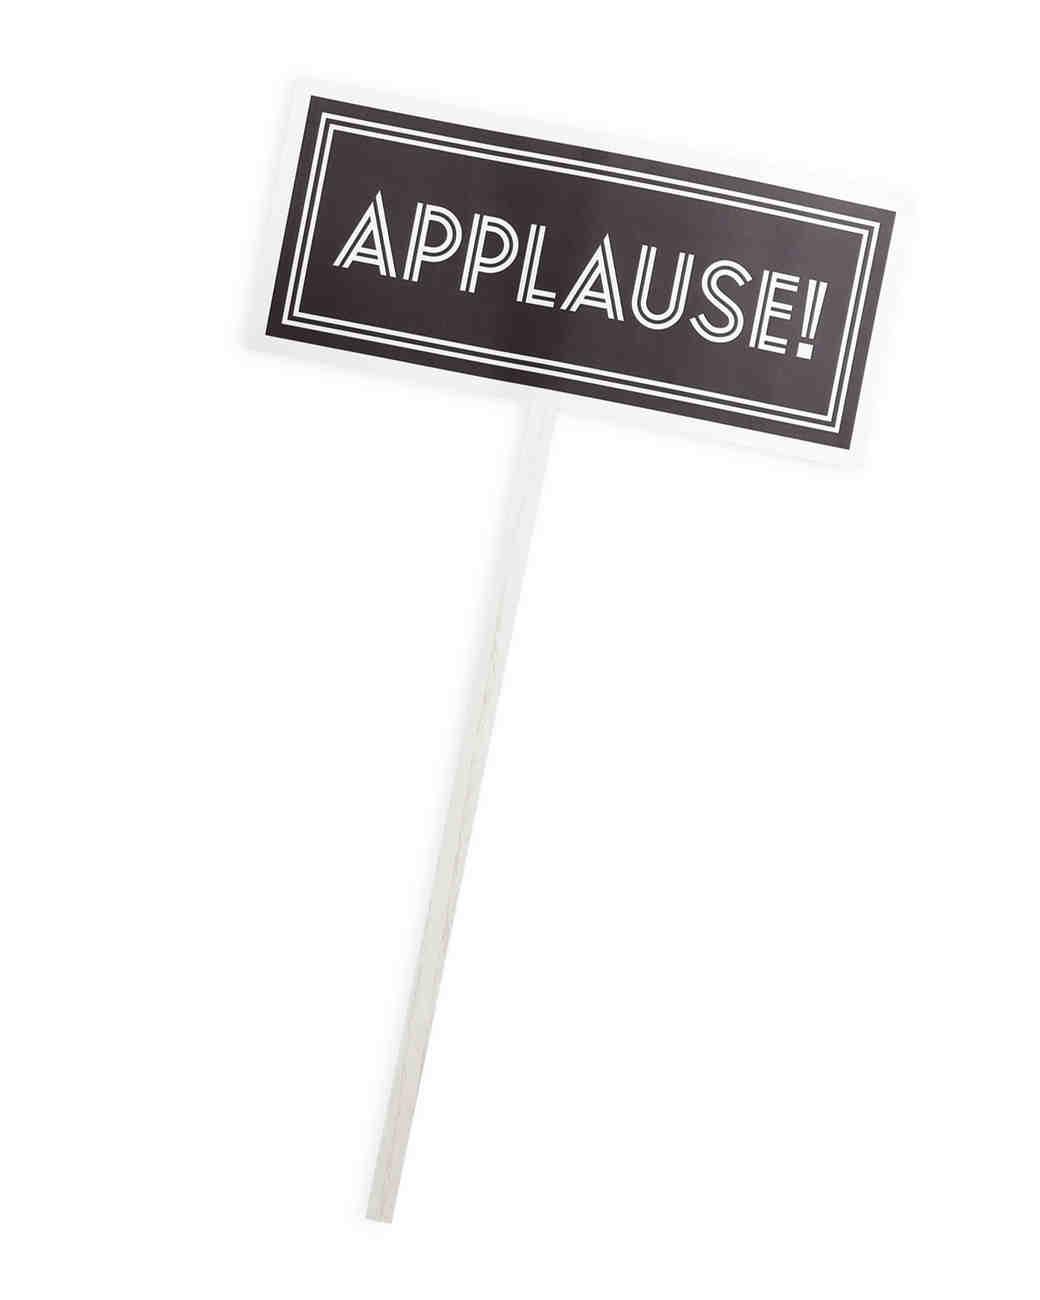 applause-sign-mwd108524.jpg